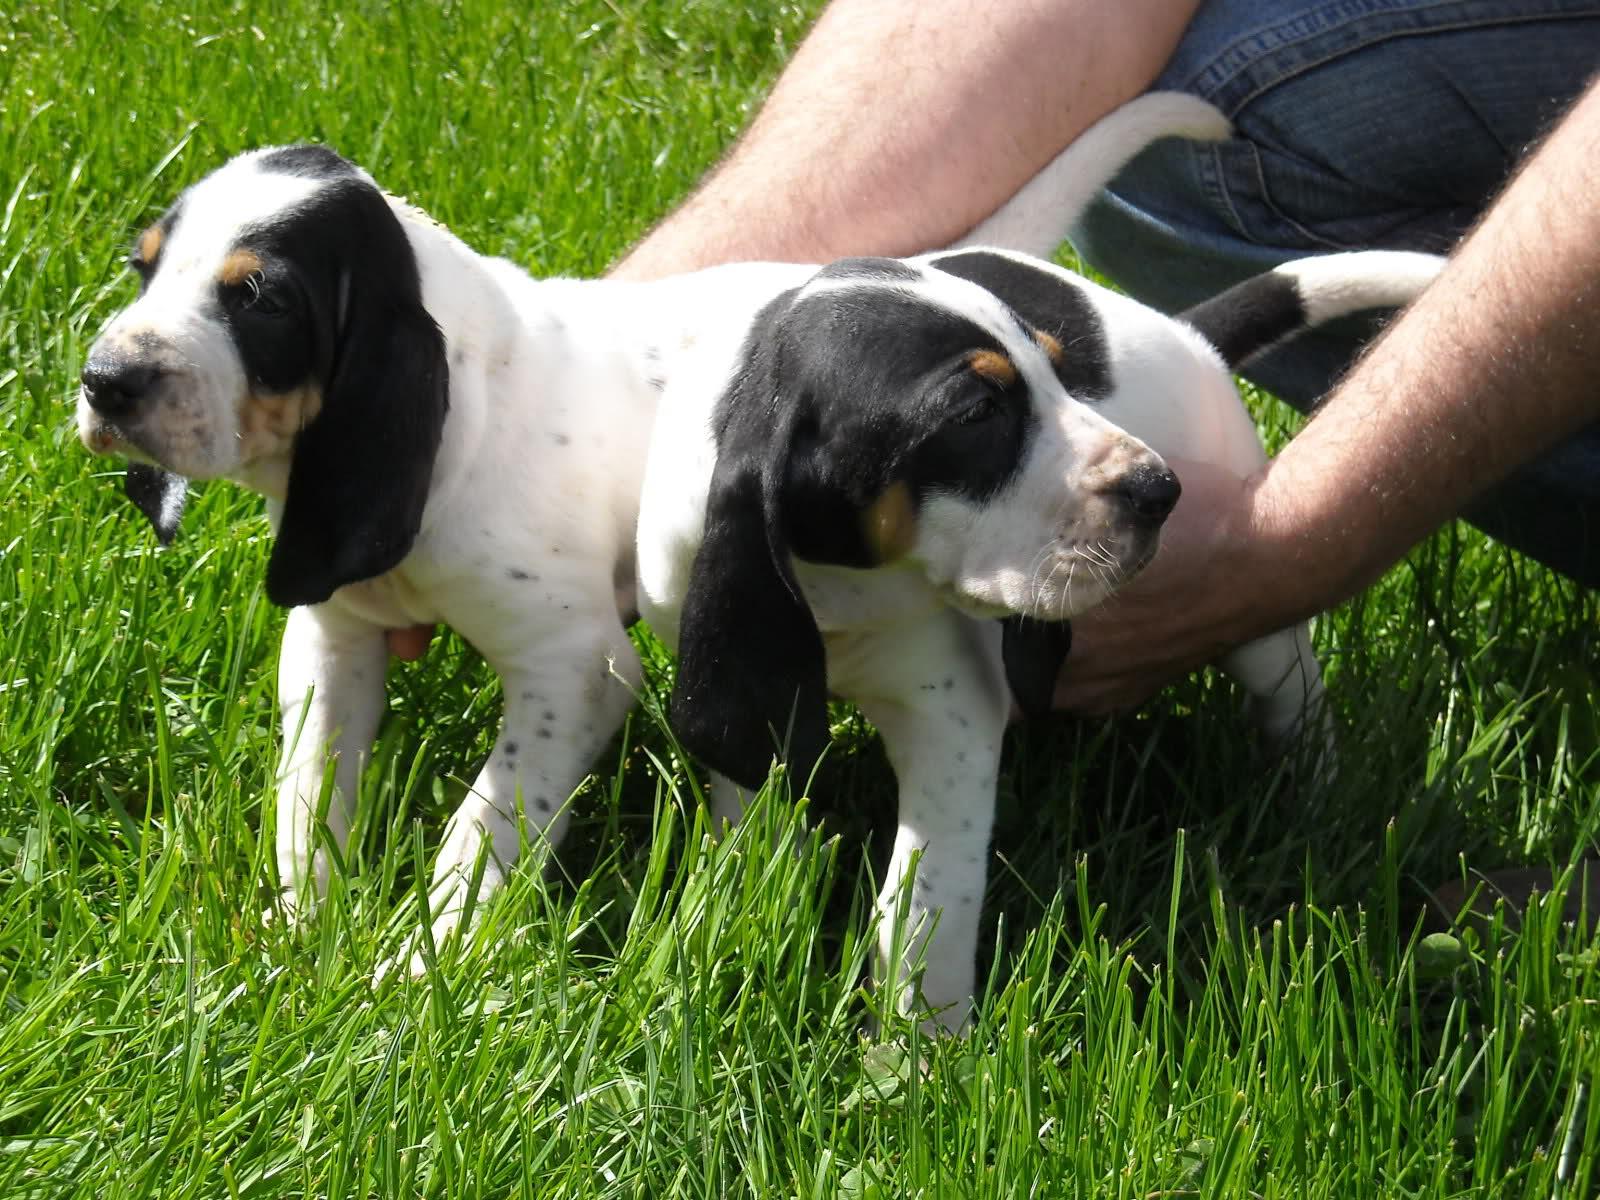 gascon saintongeois puppies photo and wallpaper beautiful